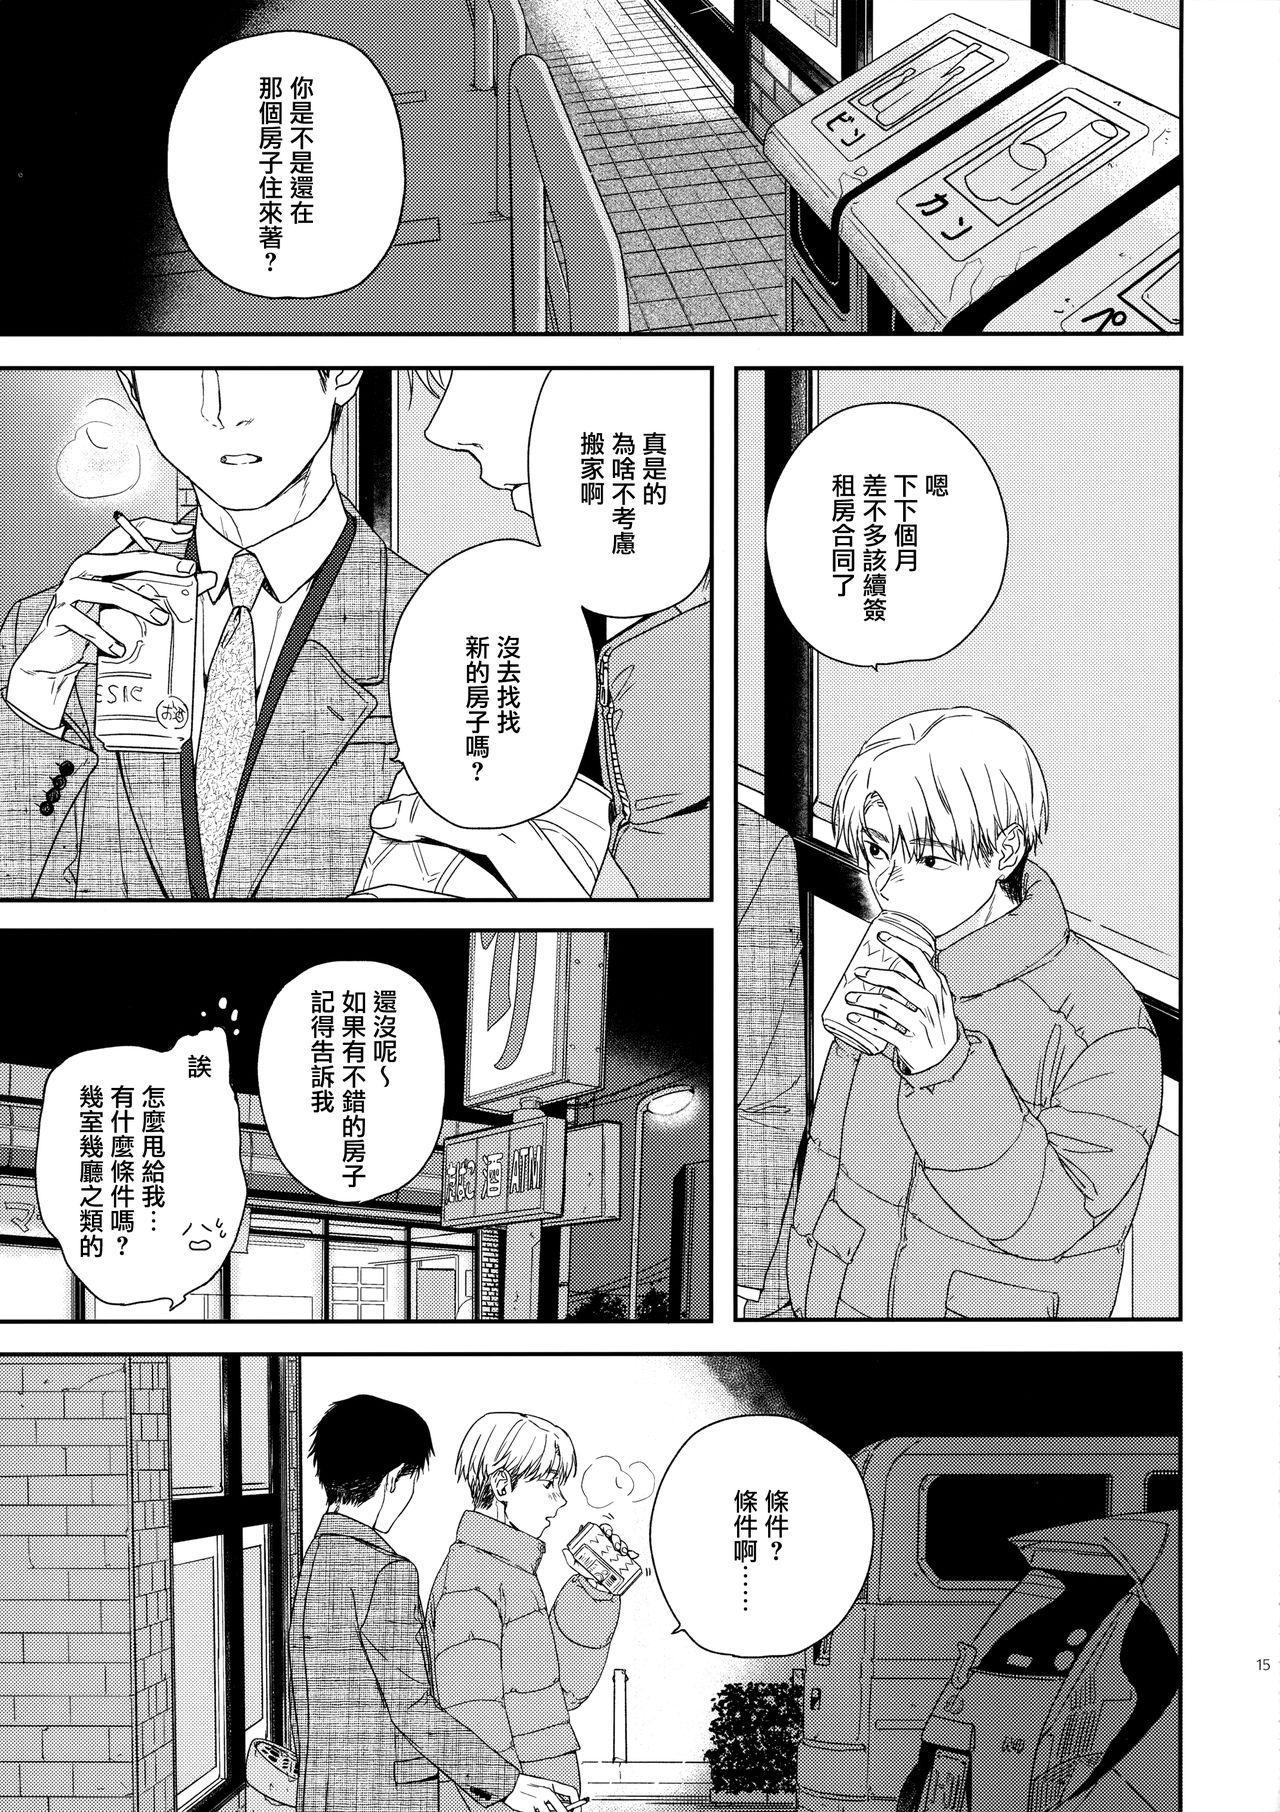 Otonari-san 14